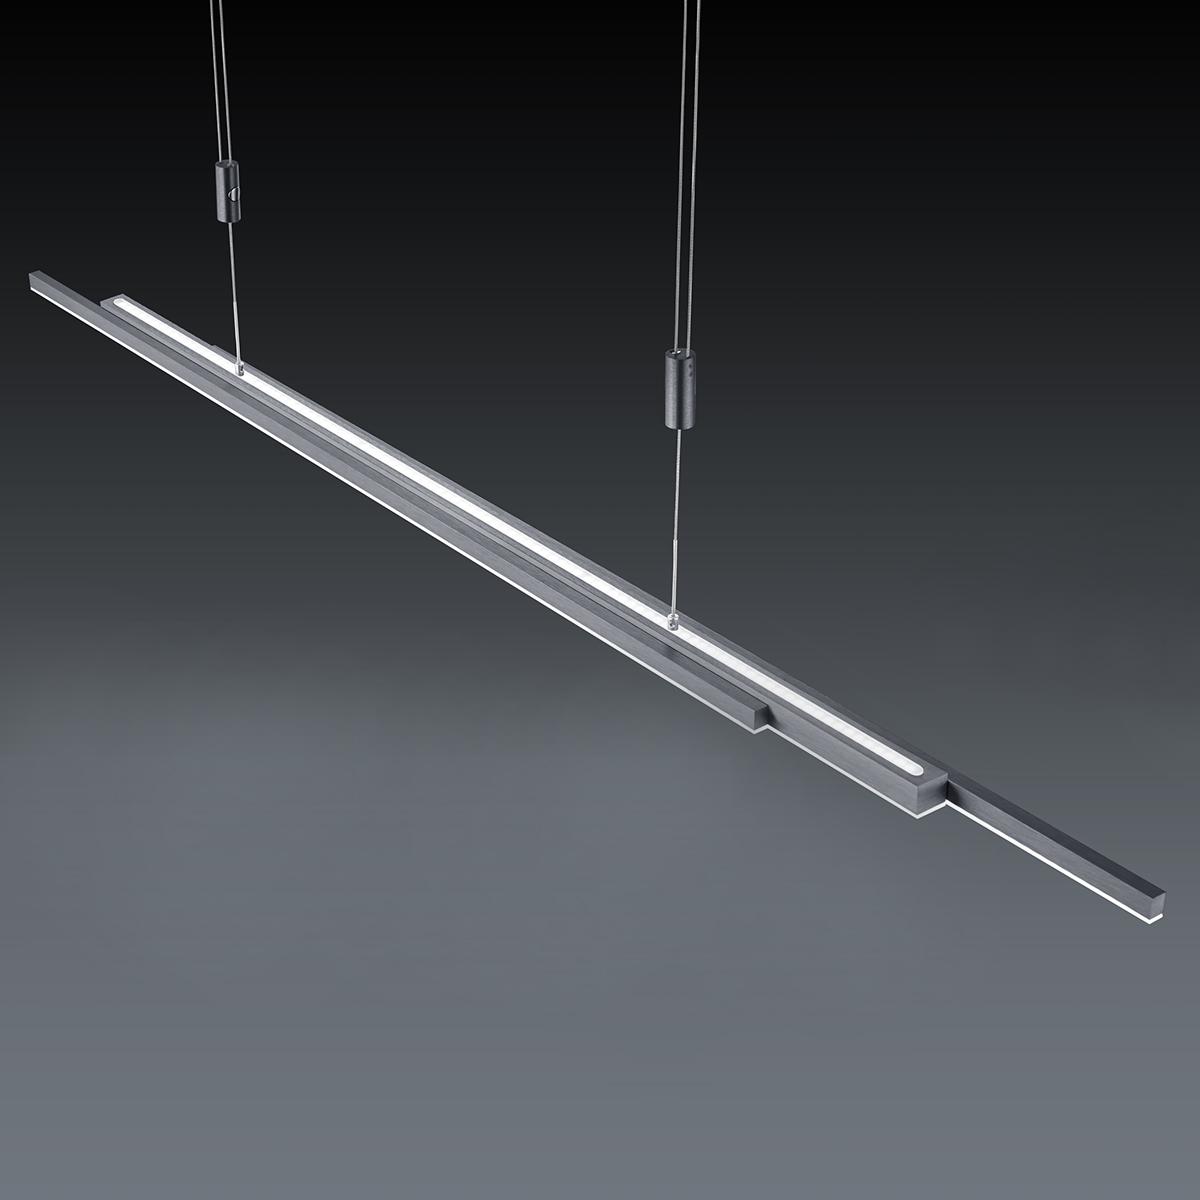 LED-Hängeleuchten von BANKAMP Leuchtenmanufaktur LED-Pendelleuchte L-lightline/ up and down 2154/1-39